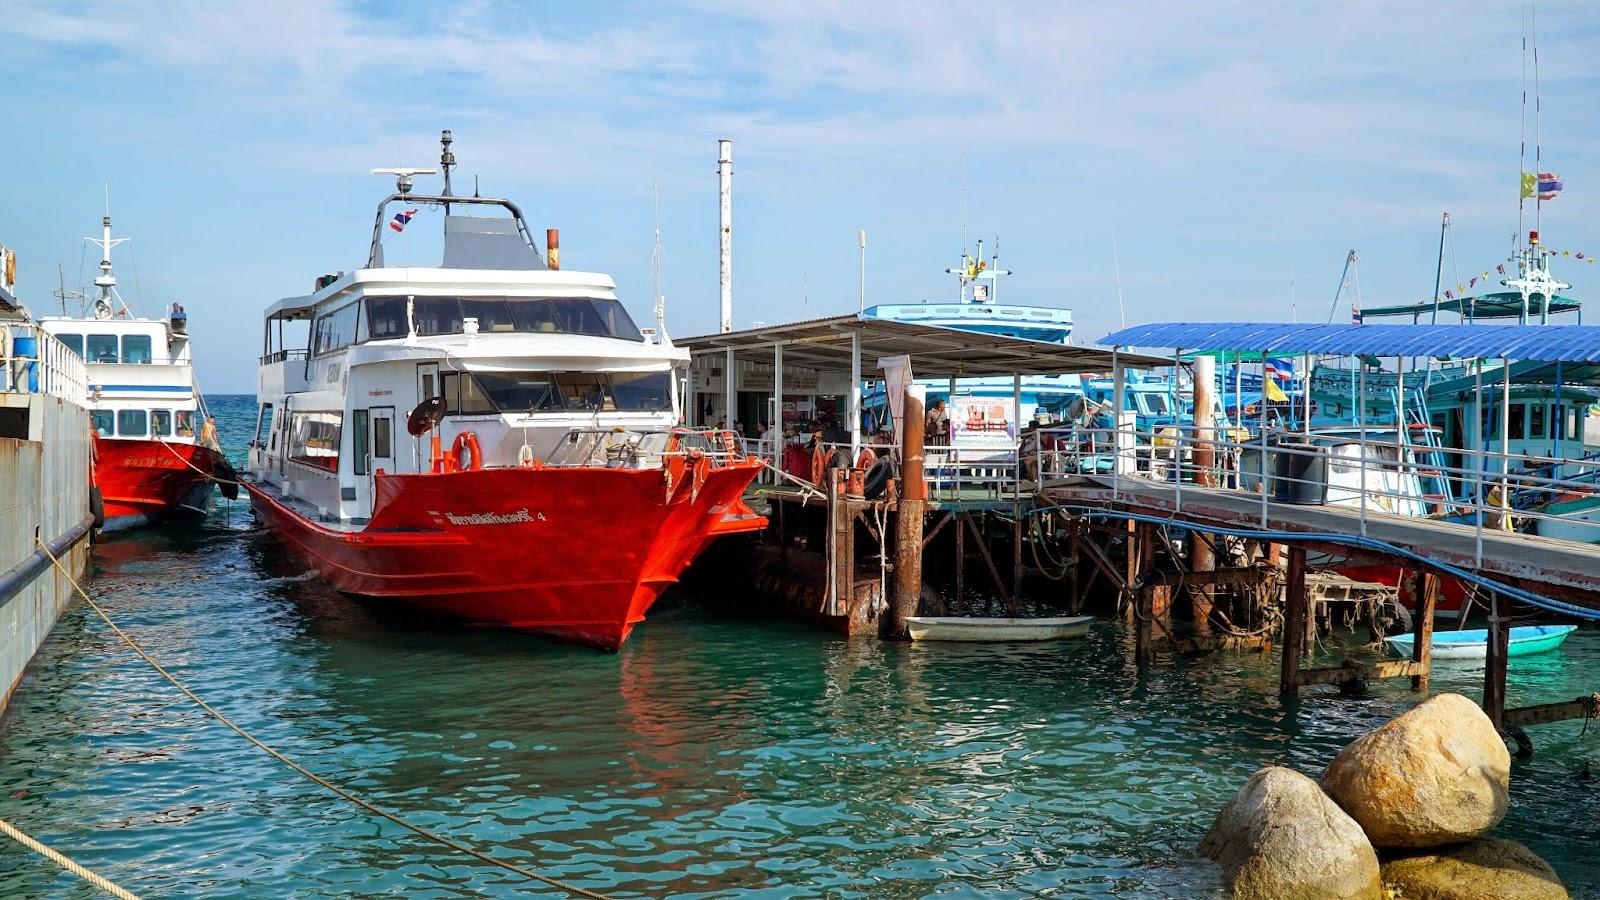 Boarding the Seatran ferry bound for Koh Phangan